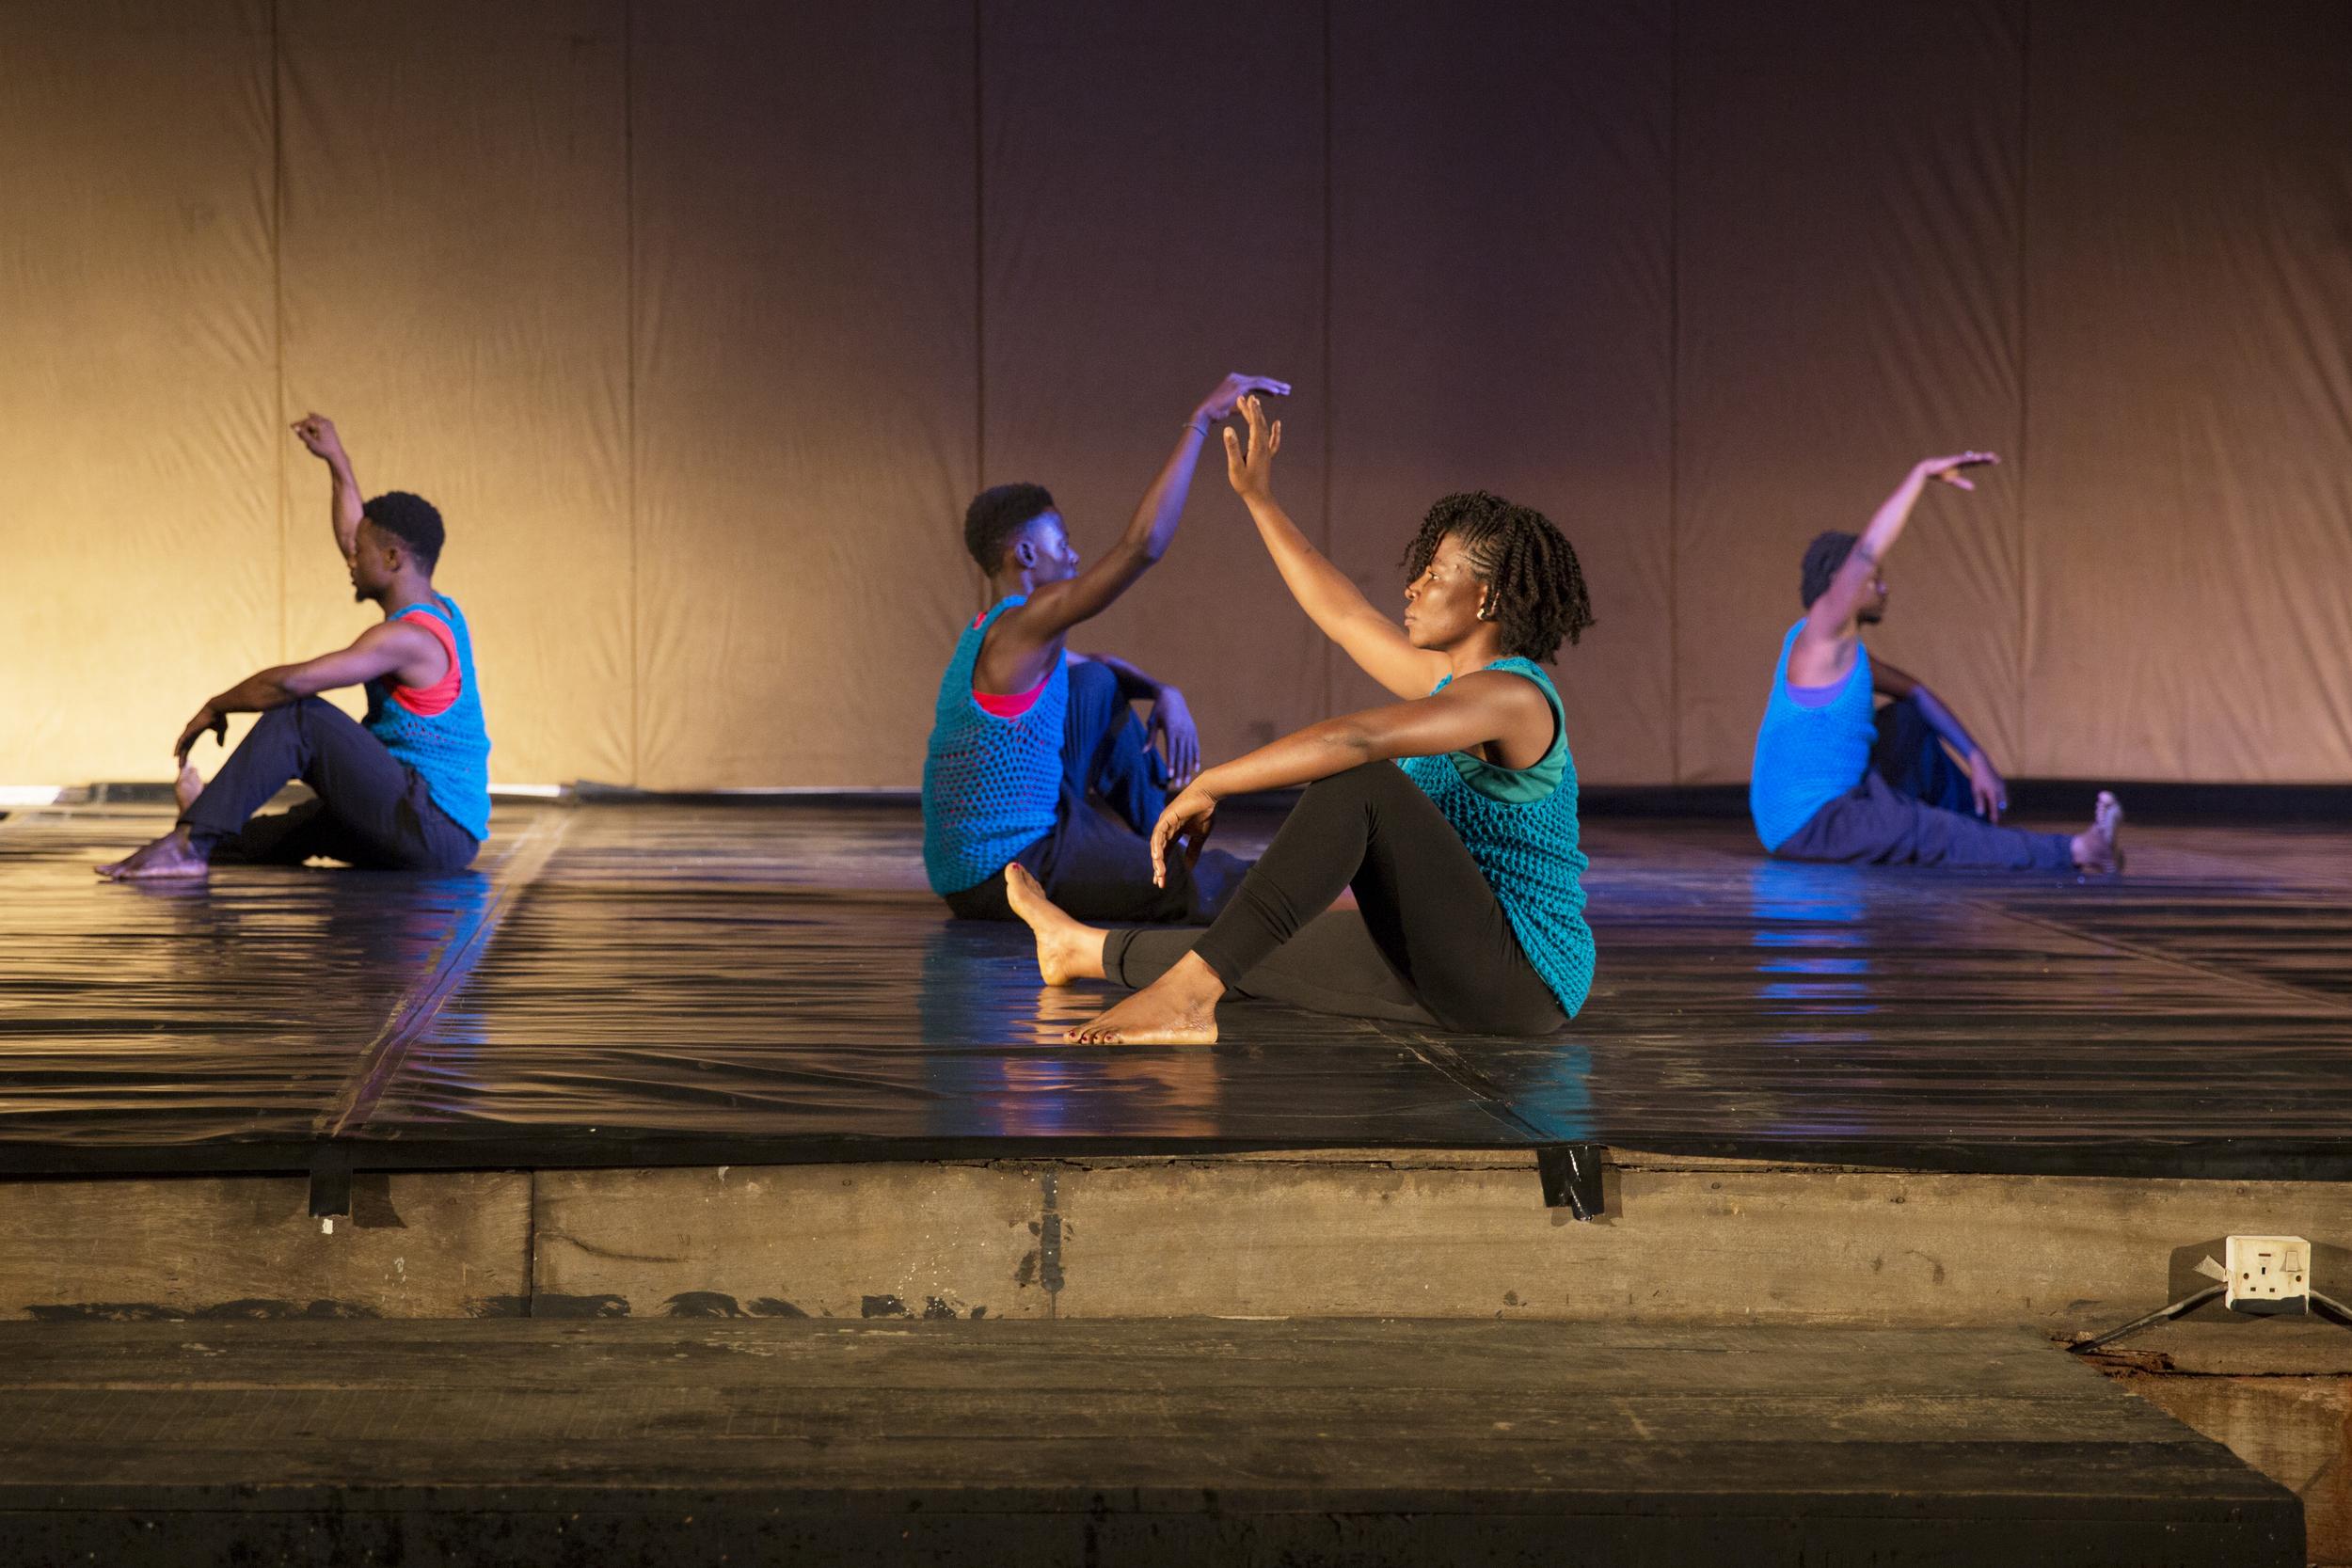 Cynthia Onoma, Ebenezer Nii Aqwei Addotey, Jeremiah O. Atcheah, and Stephen Kofi Agyekum perform in the first dance.